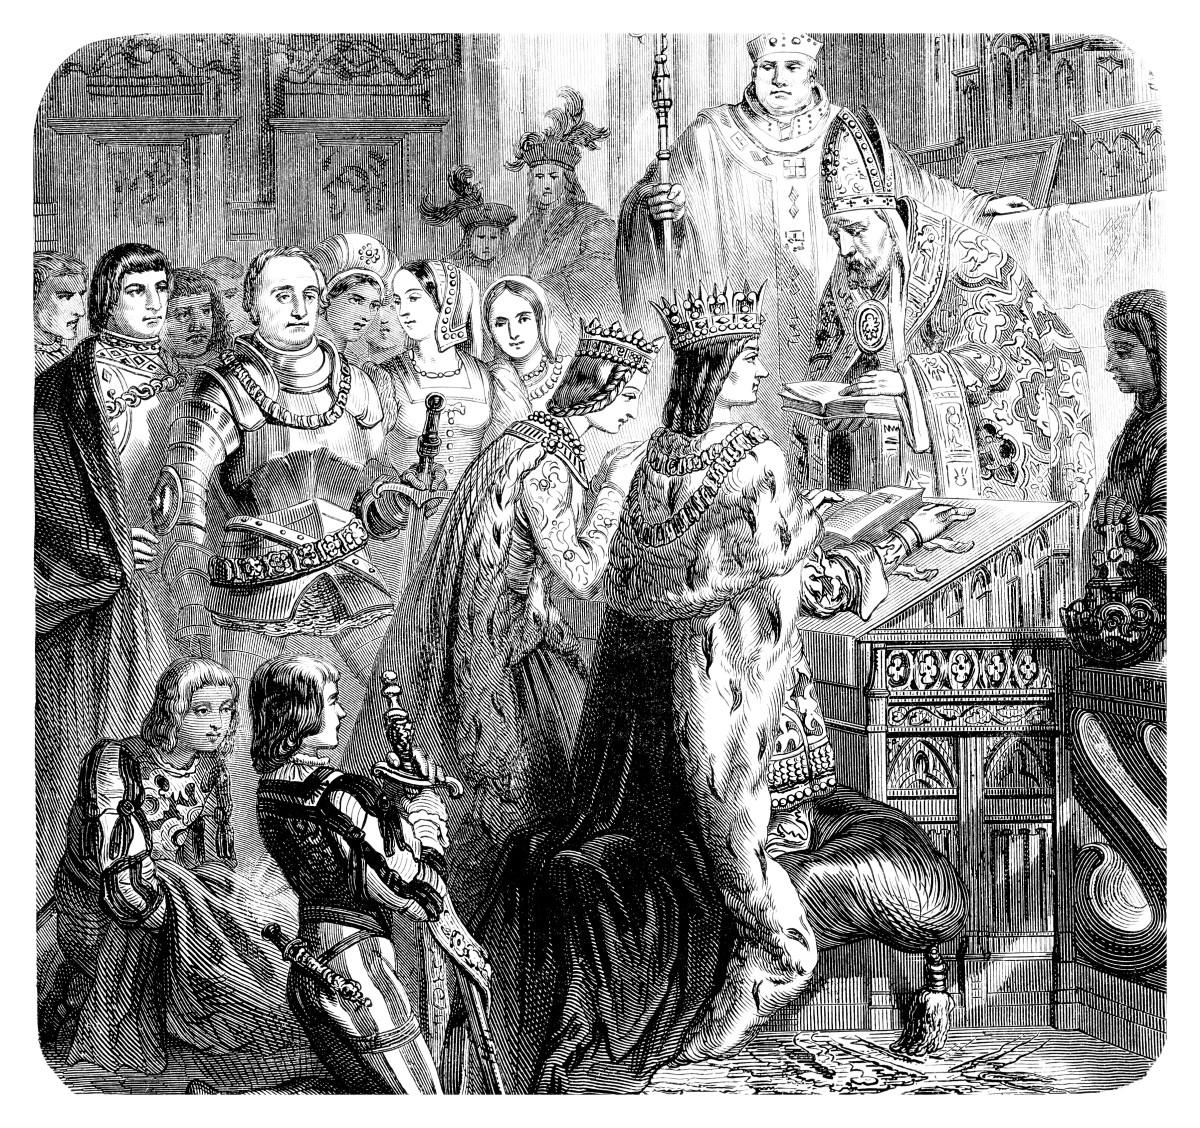 The King's Arrangement